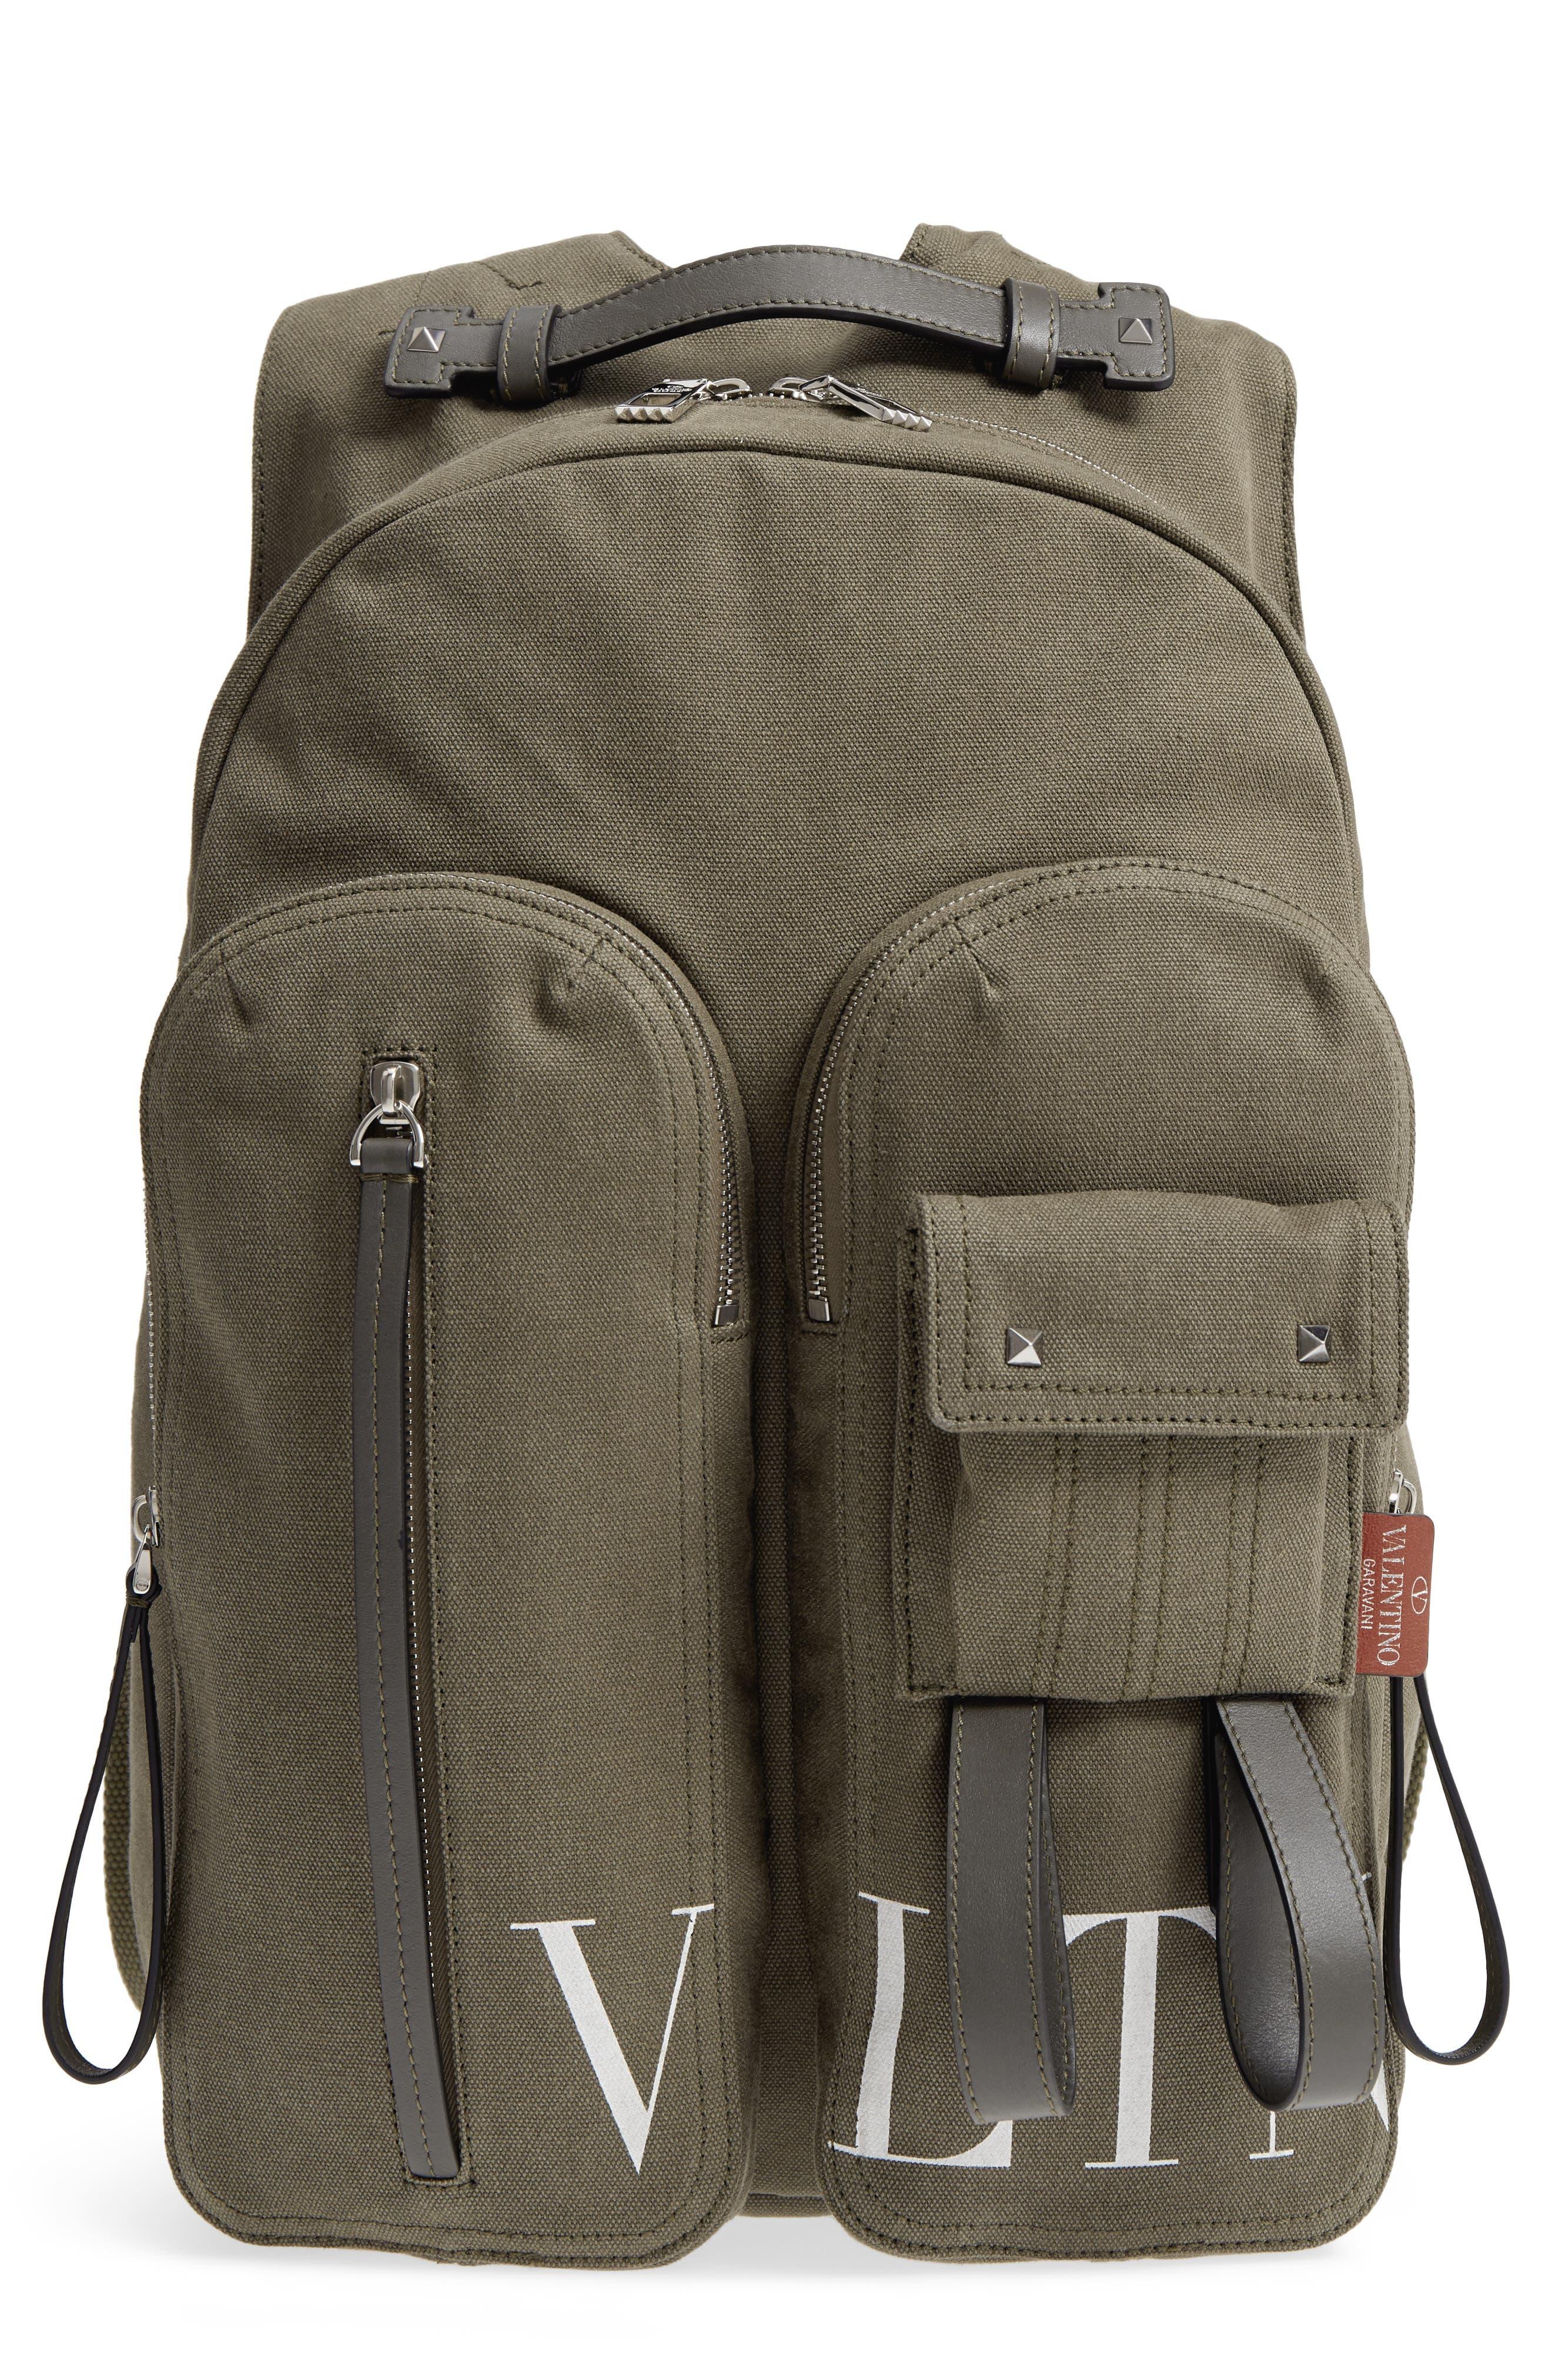 GARAVANI Canvas Military Backpack,                             Main thumbnail 1, color,                             L90 Olive